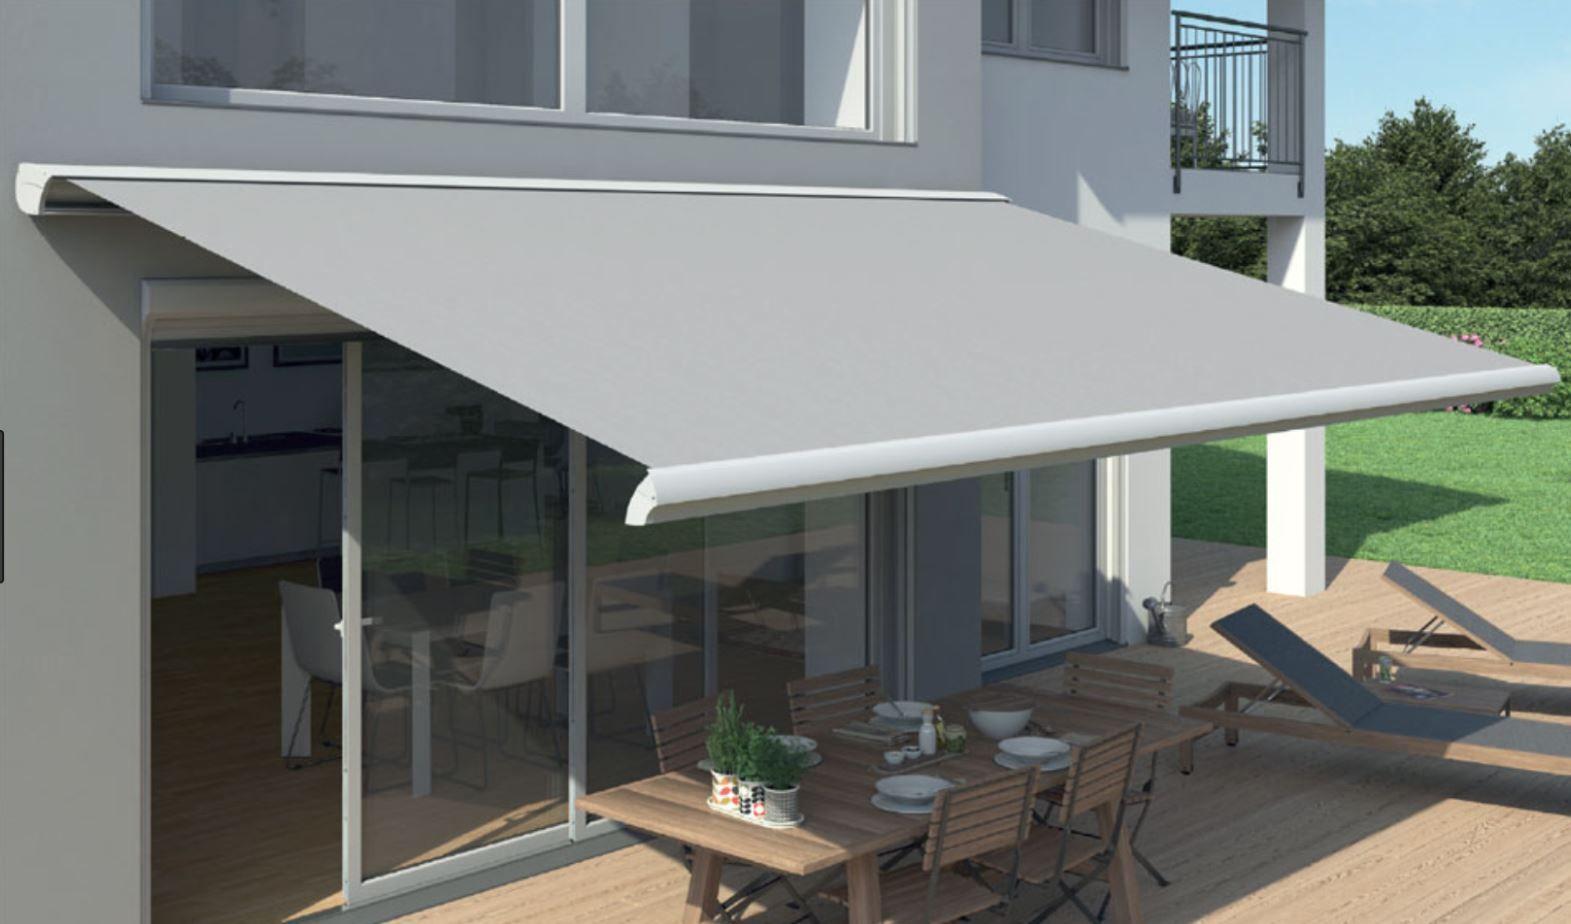 Retractable Folding Arm Awnings Brisbane Outdoor Awnings Awning Retractable Roof